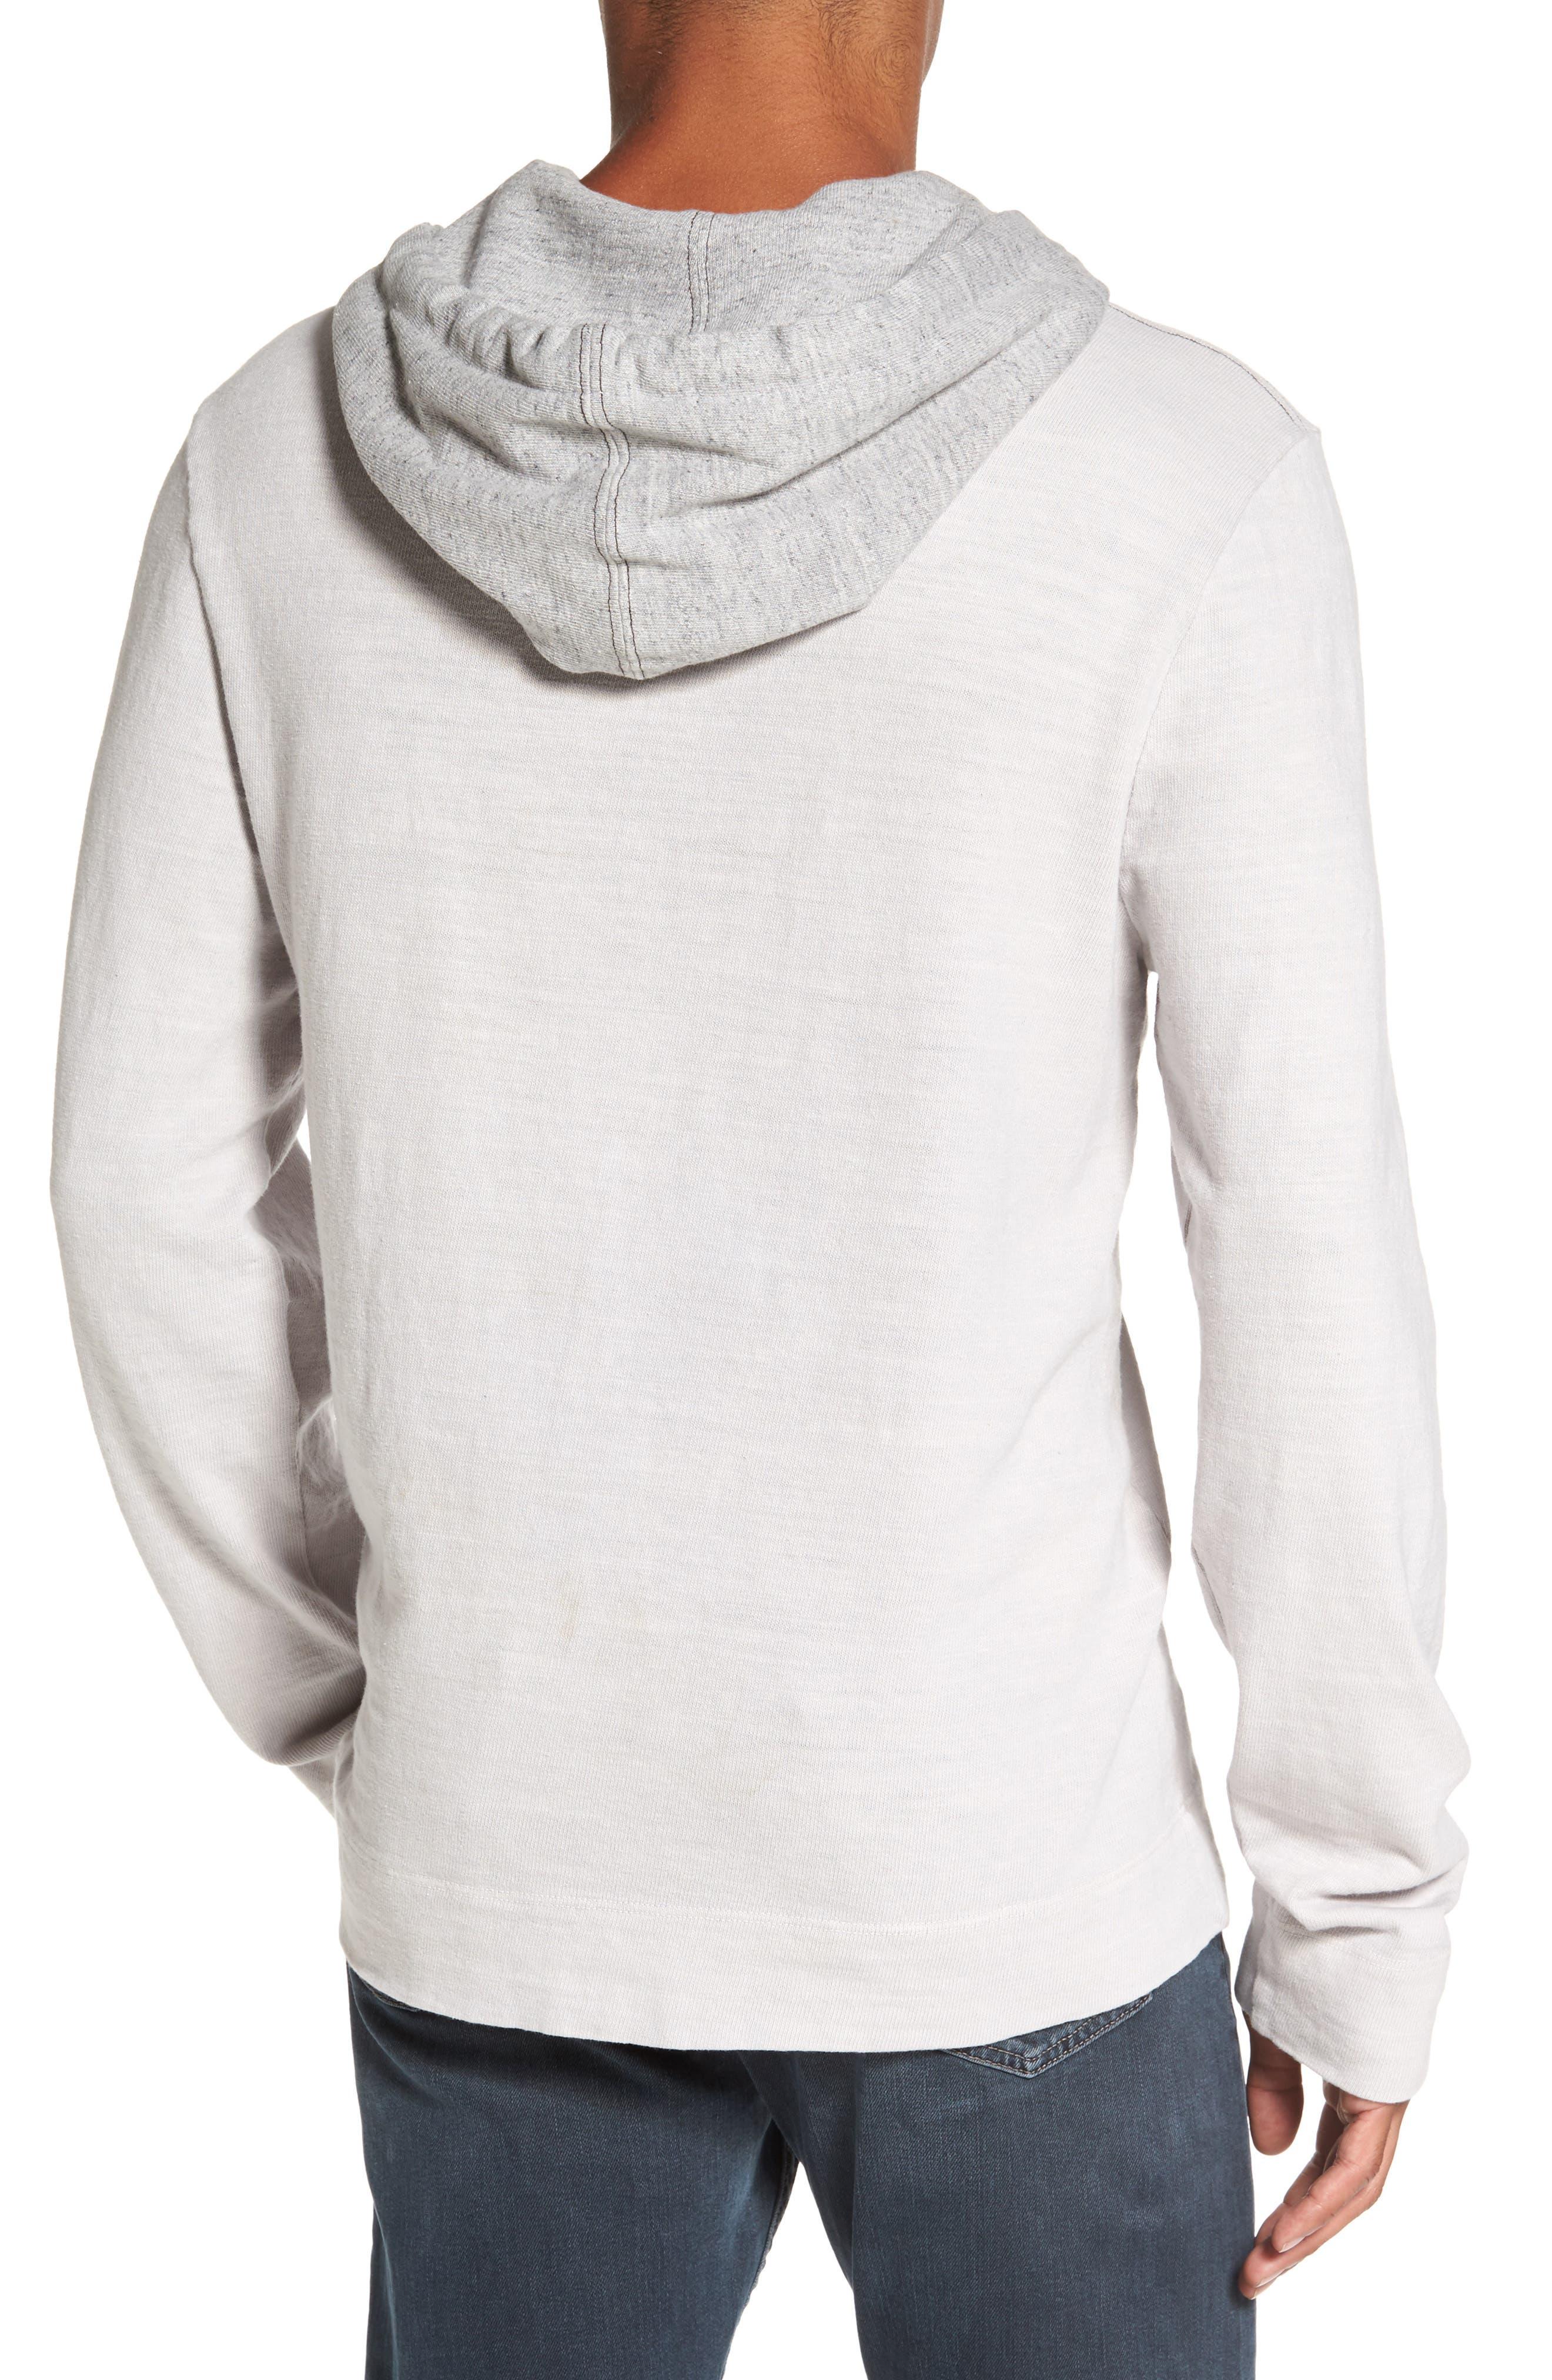 Standard Fit Pullover Hoodie,                             Alternate thumbnail 2, color,                             Concrete Dust Pigment